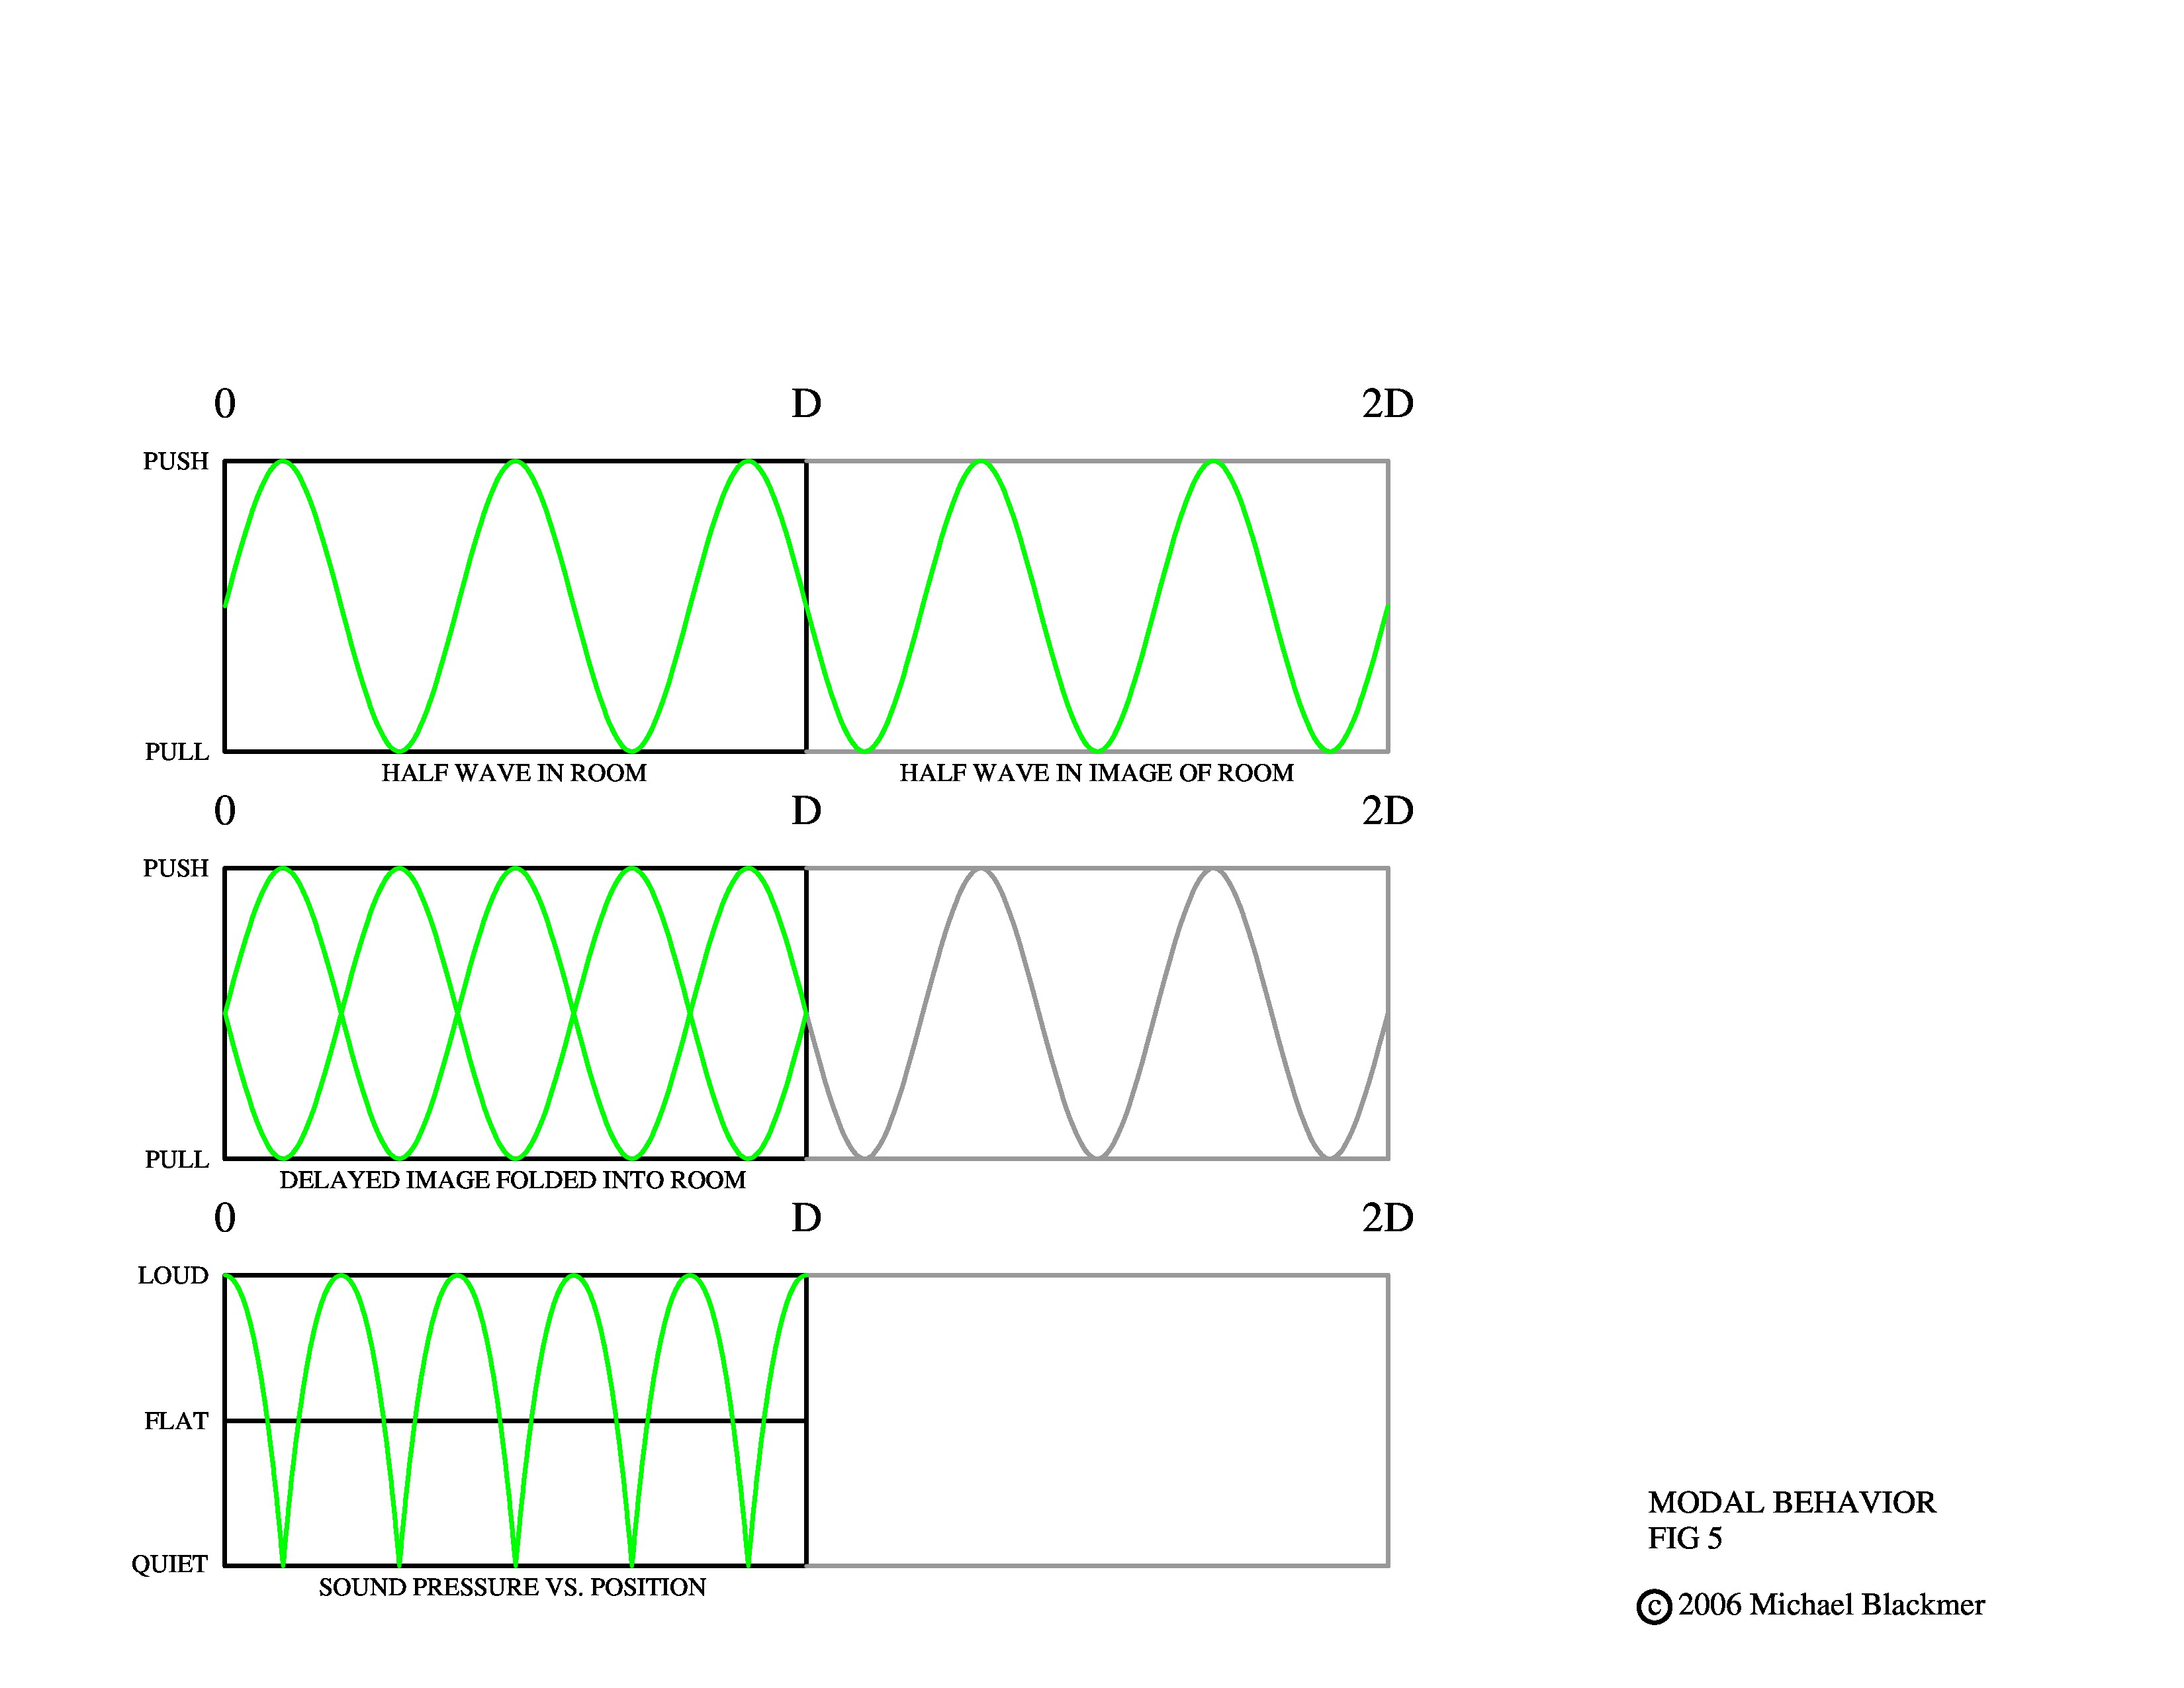 master-modal-behavior-demo-3-for-pad-fig-5-2-page-0